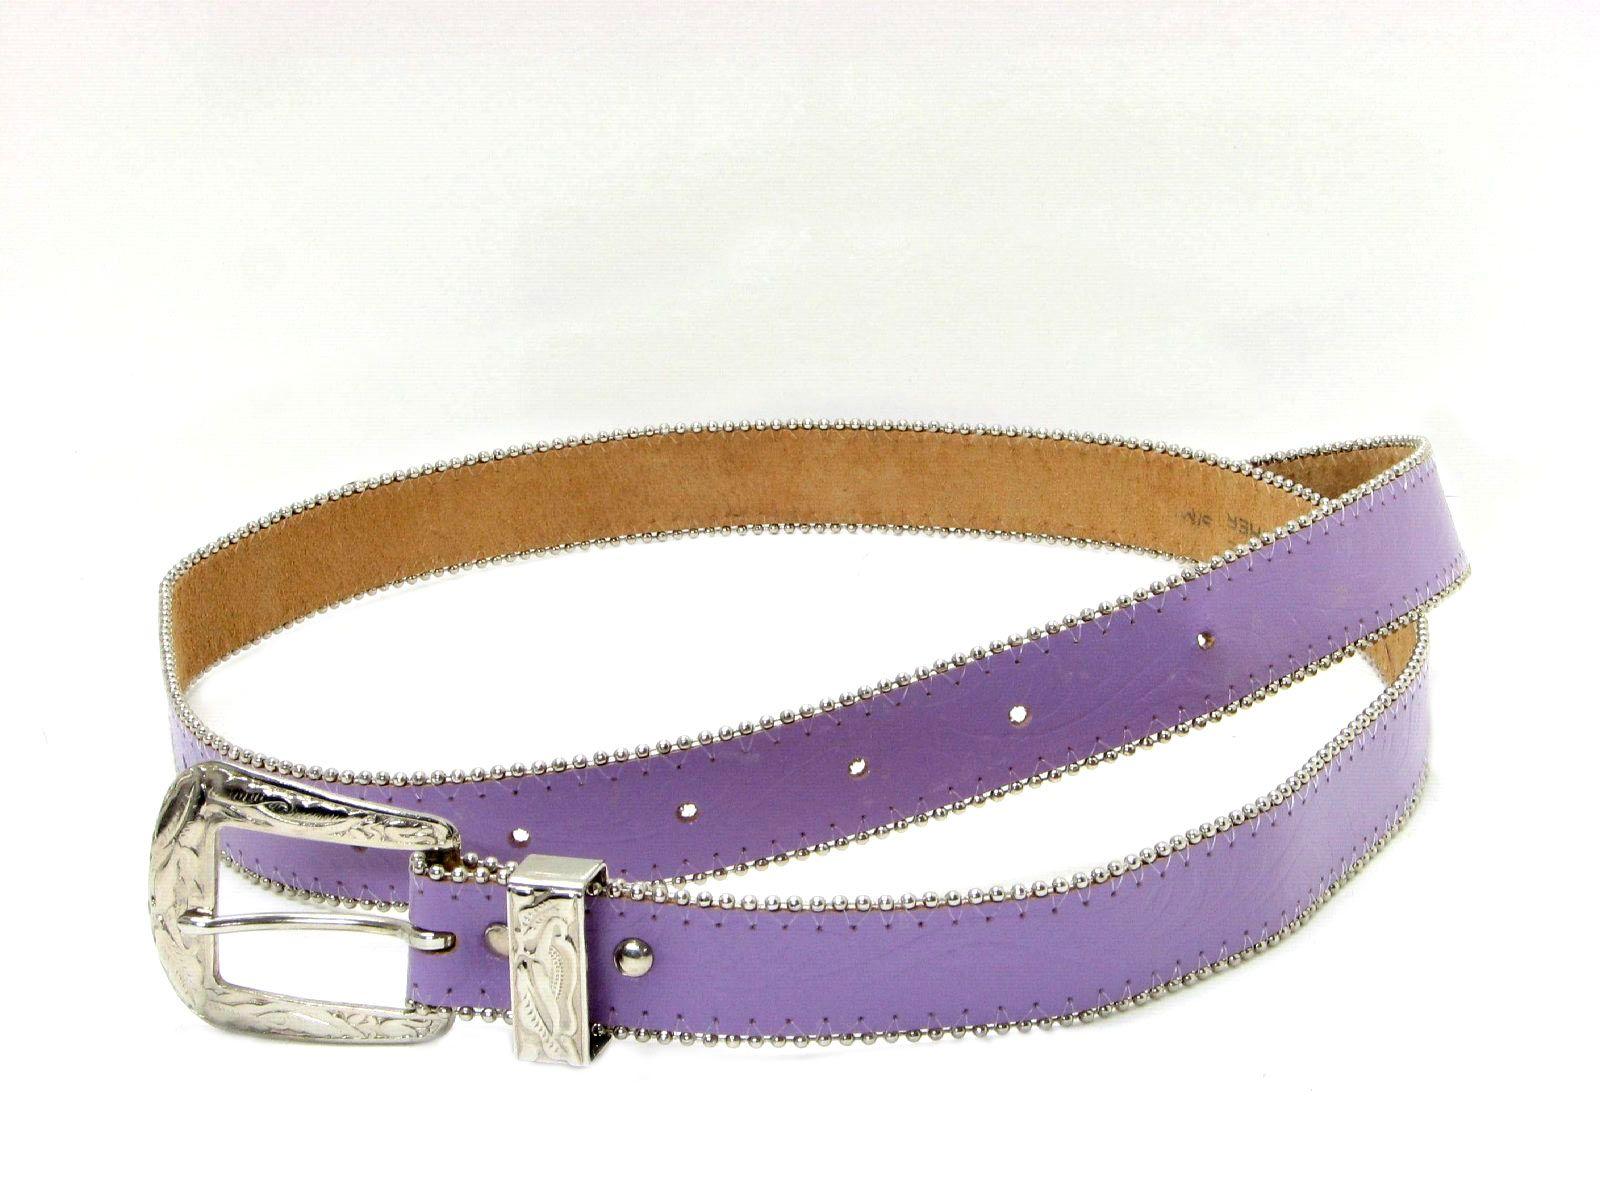 Vintage Genuine Leather 80's Belt: 80s -Genuine Leather- Womens lavender genuine leather Western belt with silvertone metal leaf-embossed buckle, bead chain edging, slight embossing on leaves on belt